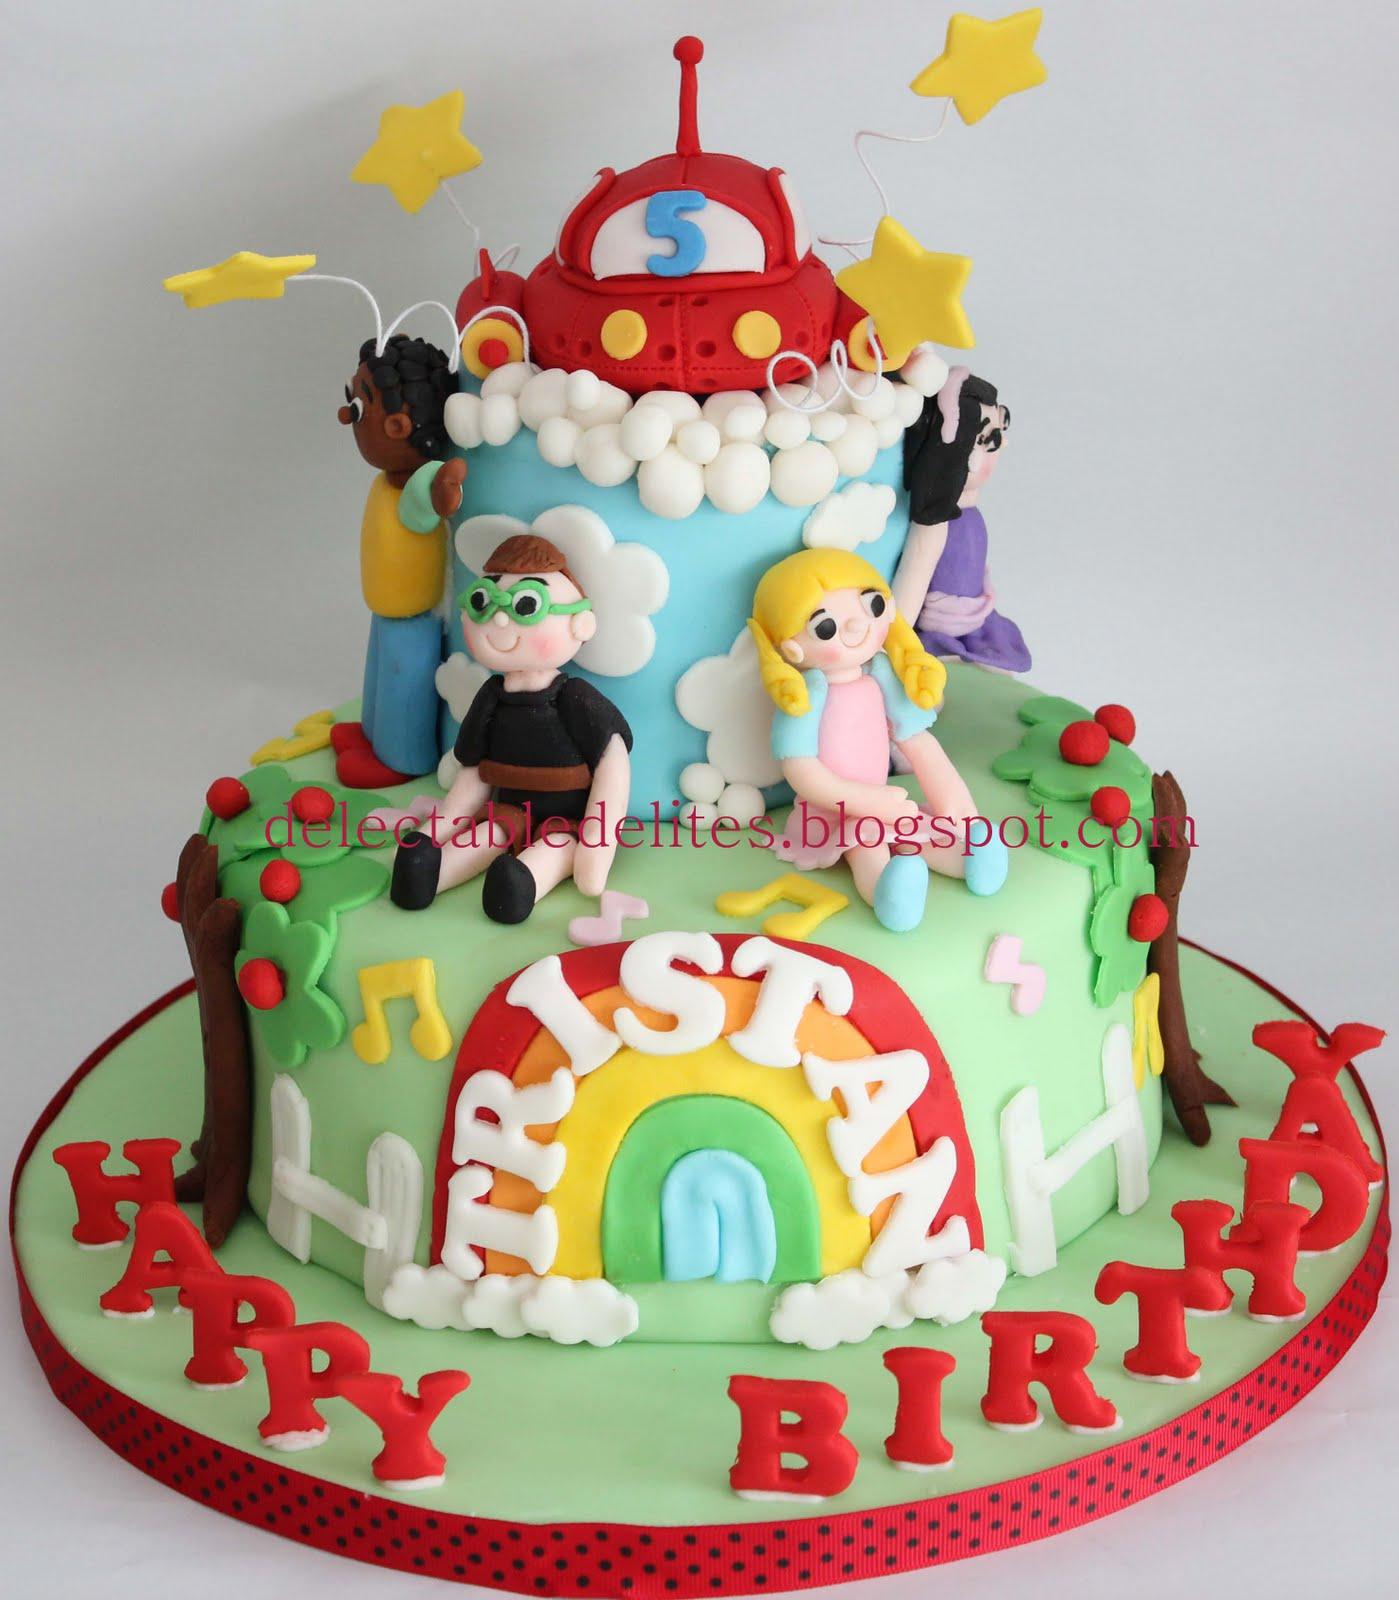 Delectable Delites Little Einstein Cake For Tristans 5th Birthday